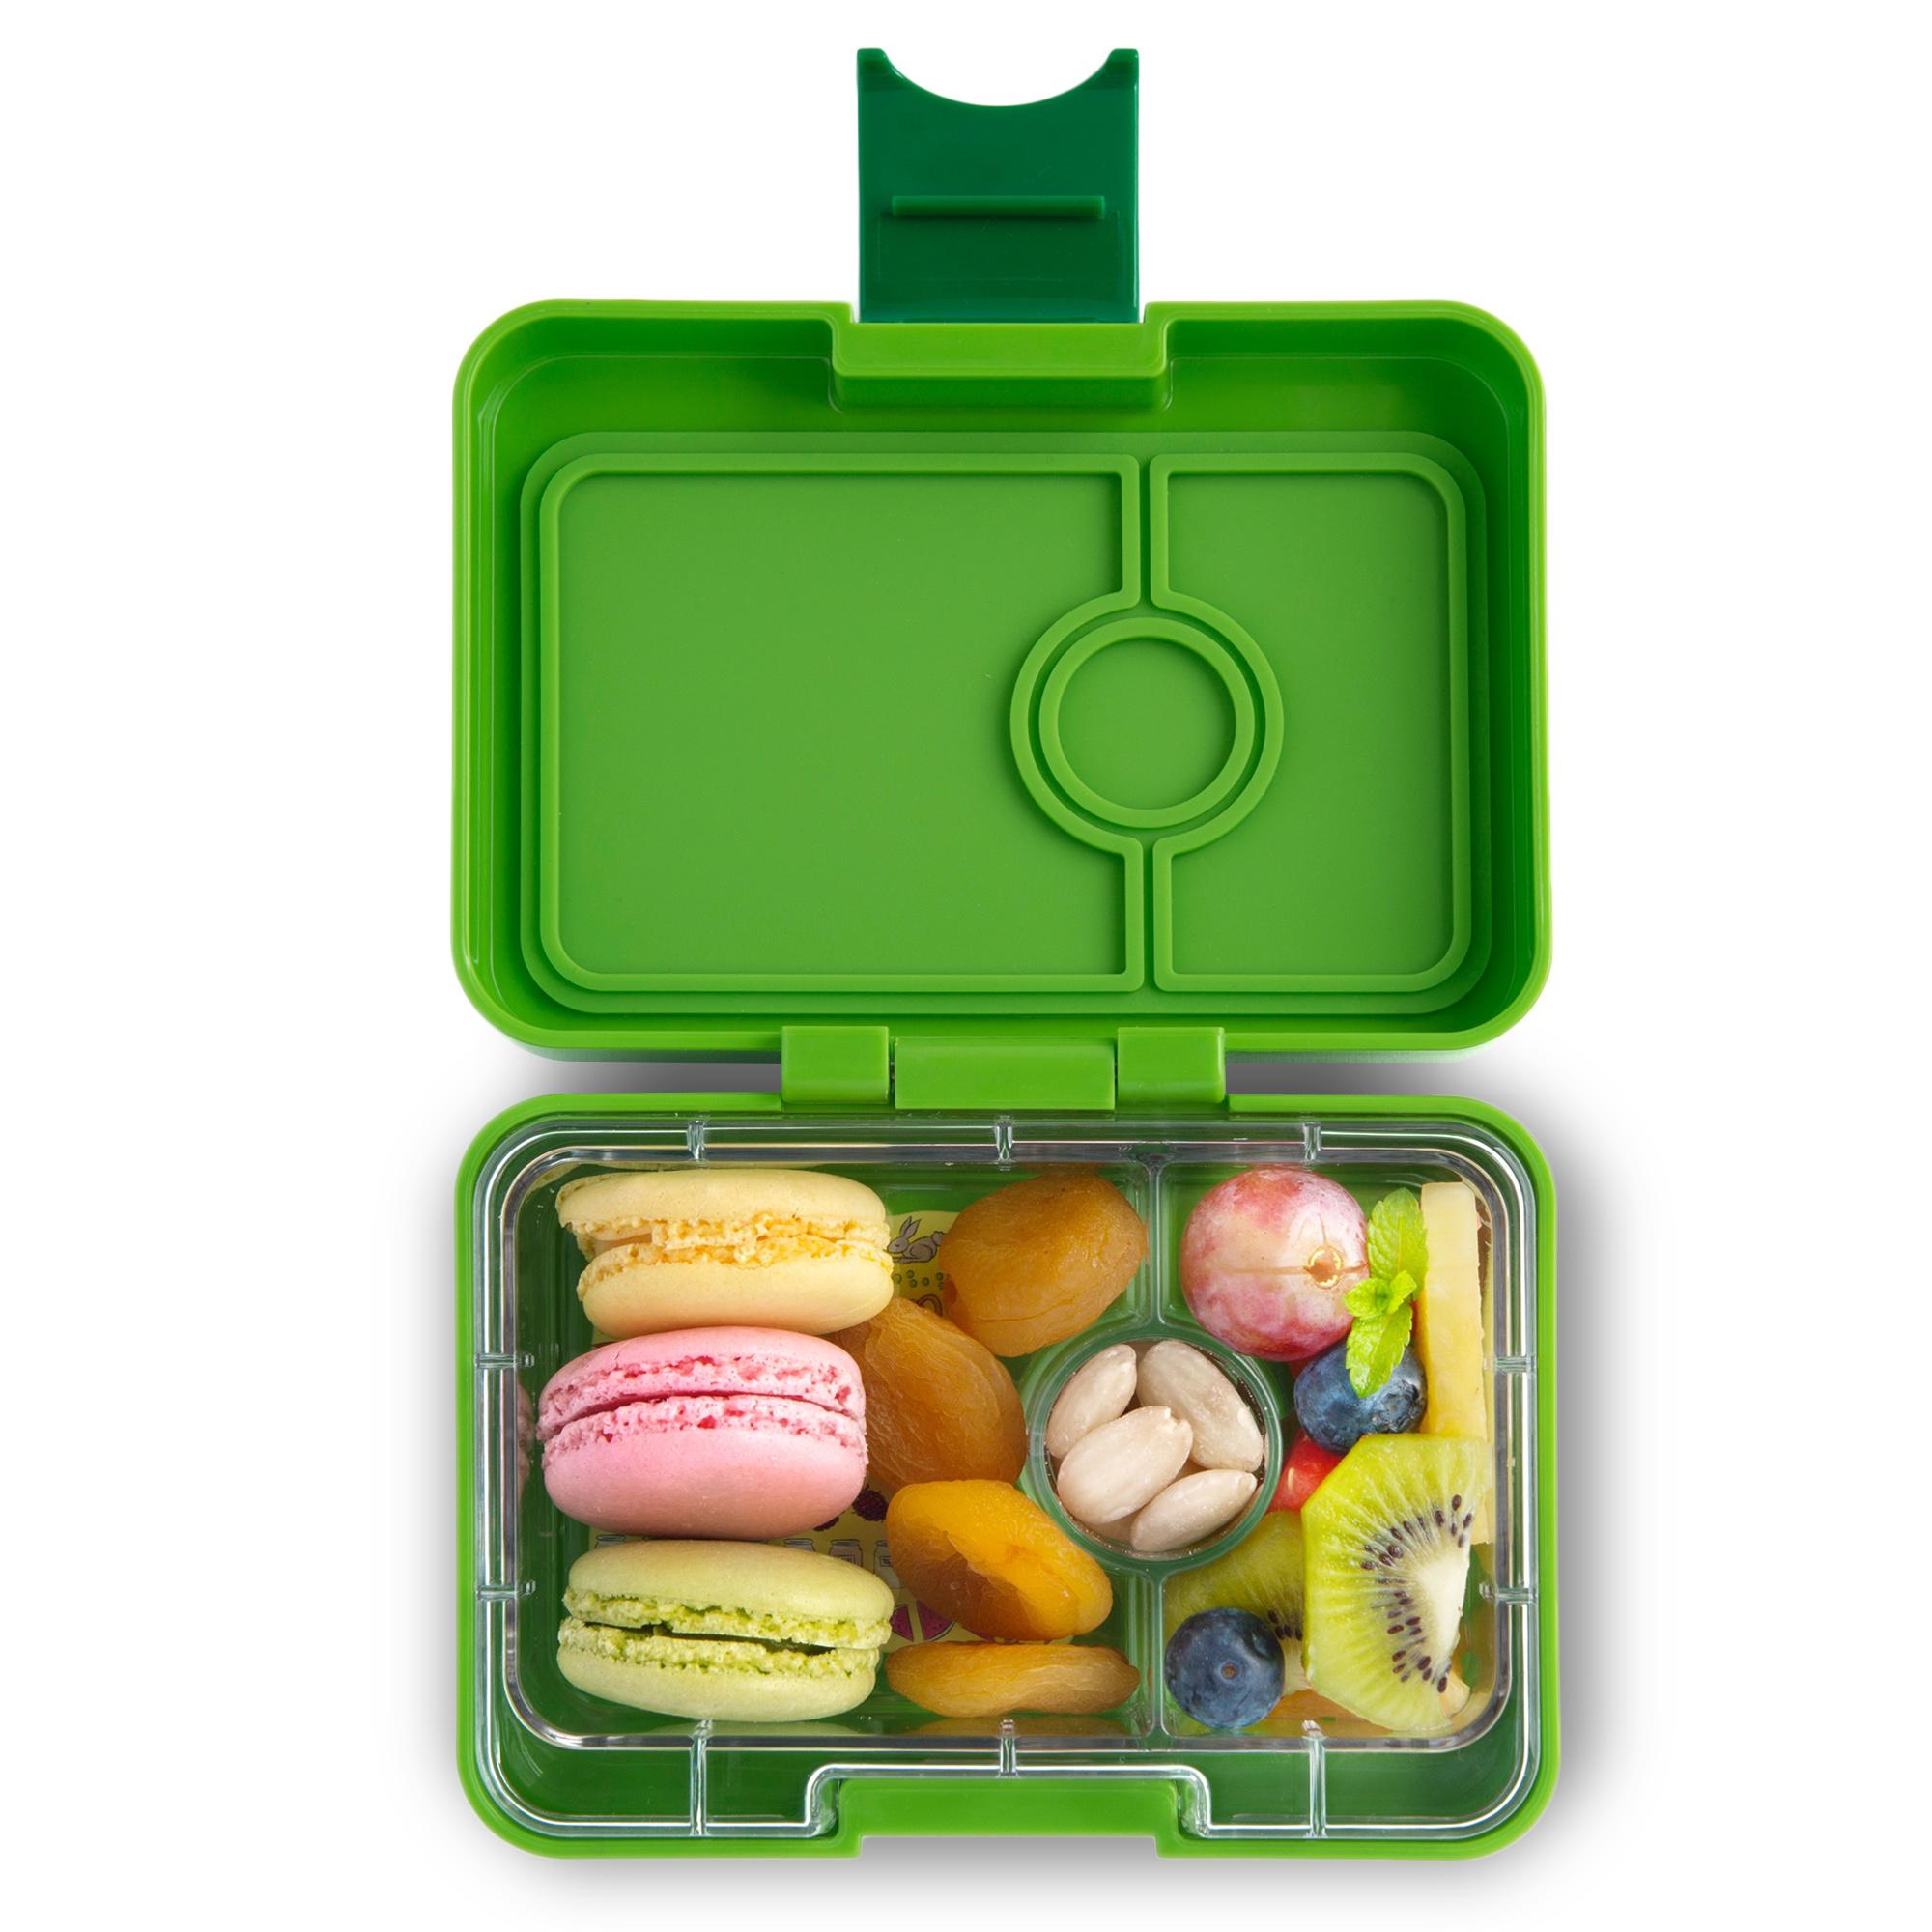 Yumbox MiniSnack broodtrommel 3 vakken Avocado groen (Go groen) / Toucan tray-1